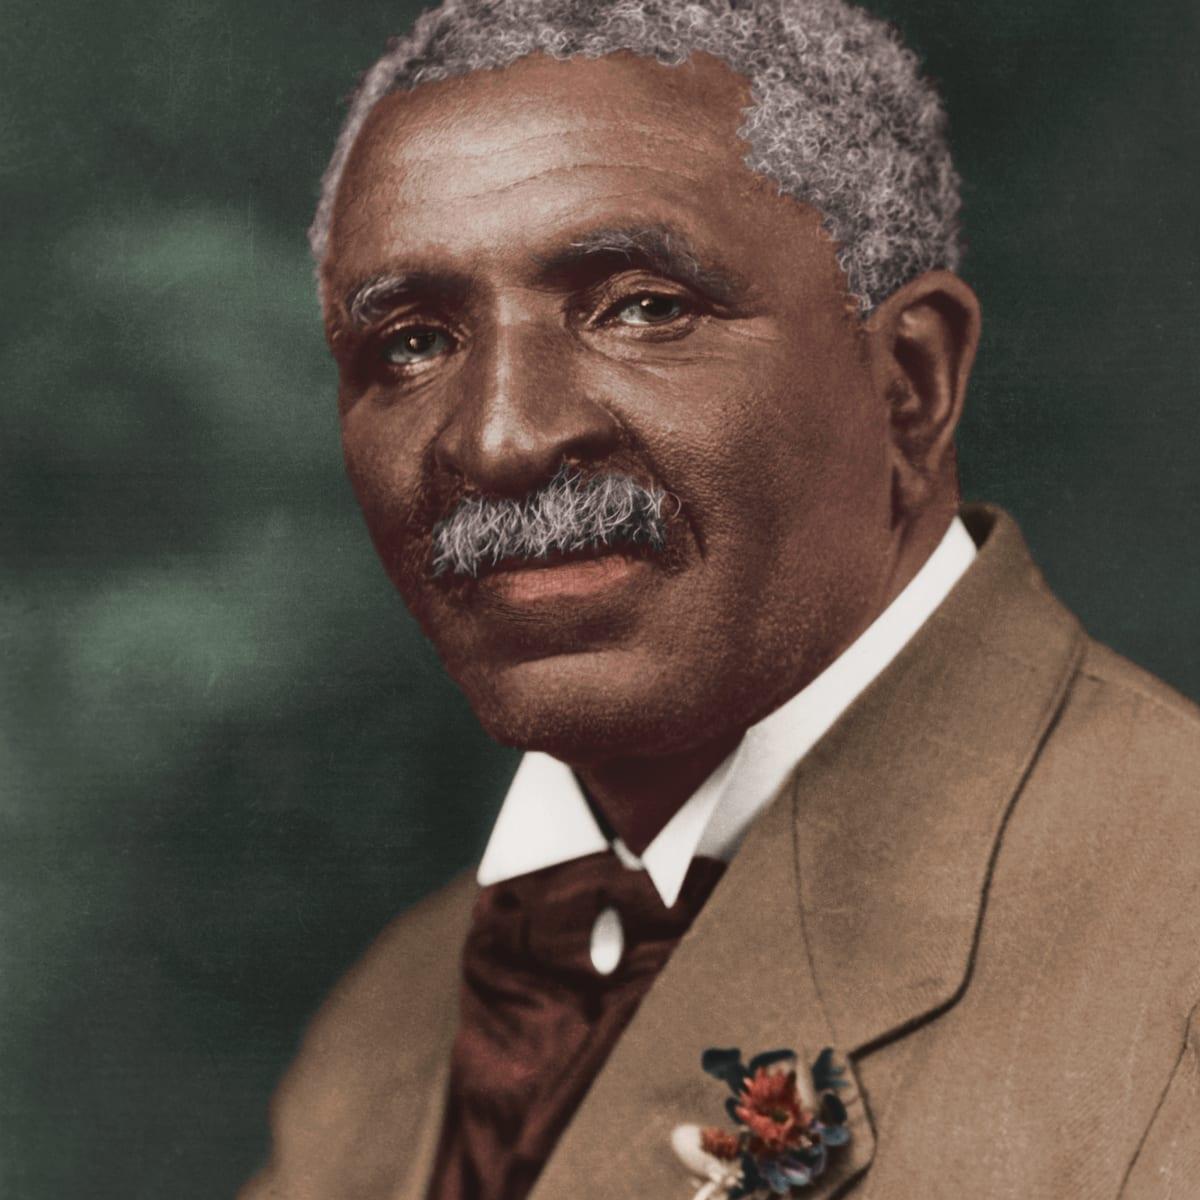 George Washington Carver- The Jessup Wagon